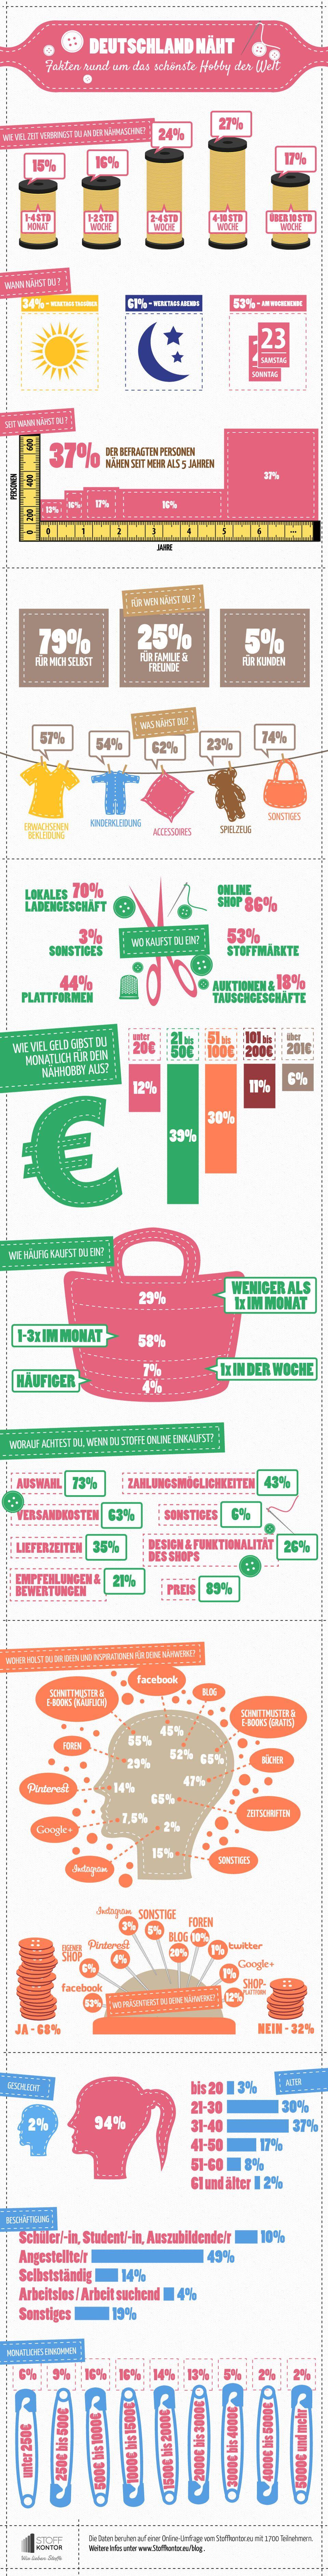 infografik - nähen in deutschland